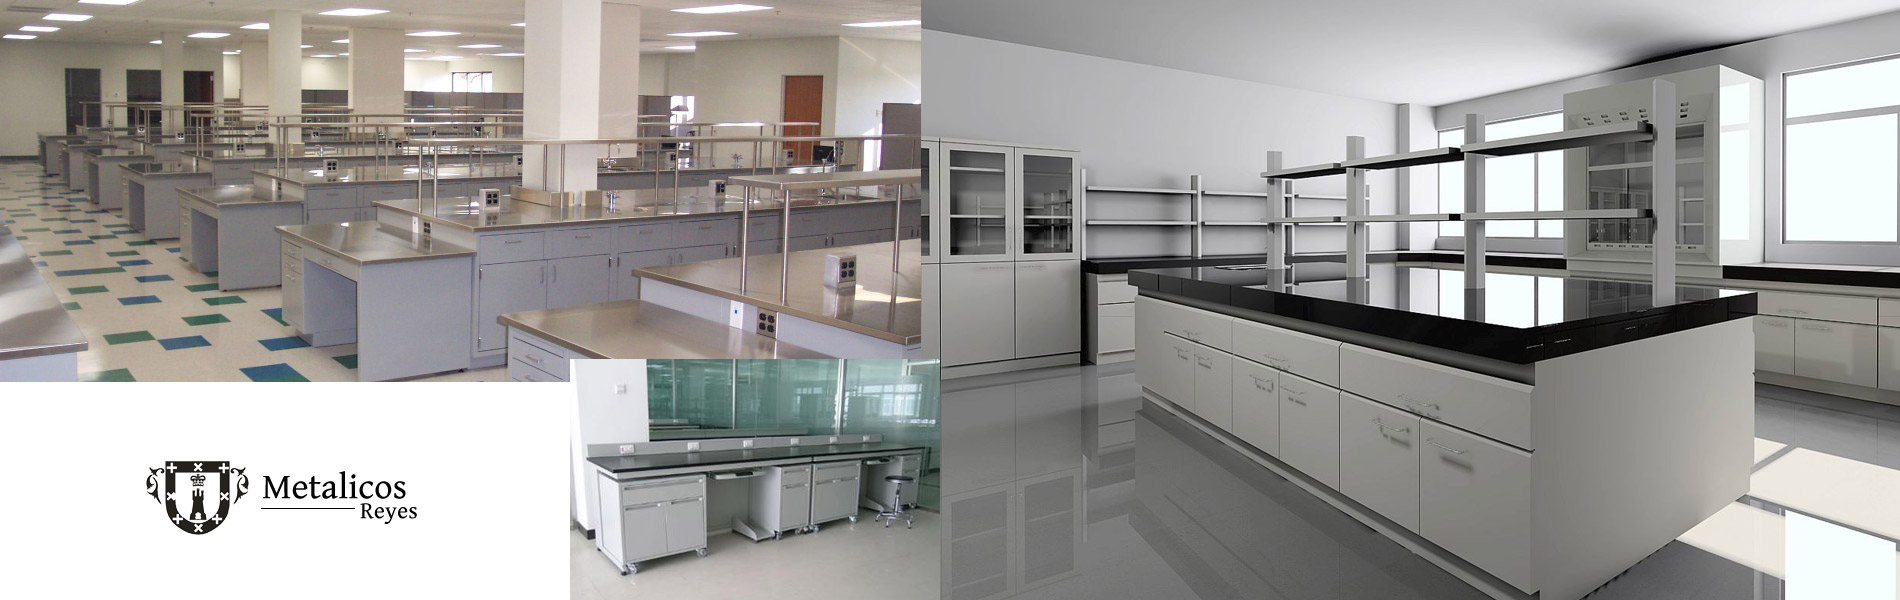 Muebles Laboratorio Segunda Mano - Muebles De Laboratorio Idee Per Interni E Mobili[mjhdah]http://www.chemlab.com.mx/img/galeria/muebles-para-laboratorio/chemlab-muebles-para-laboratorio-3.jpg